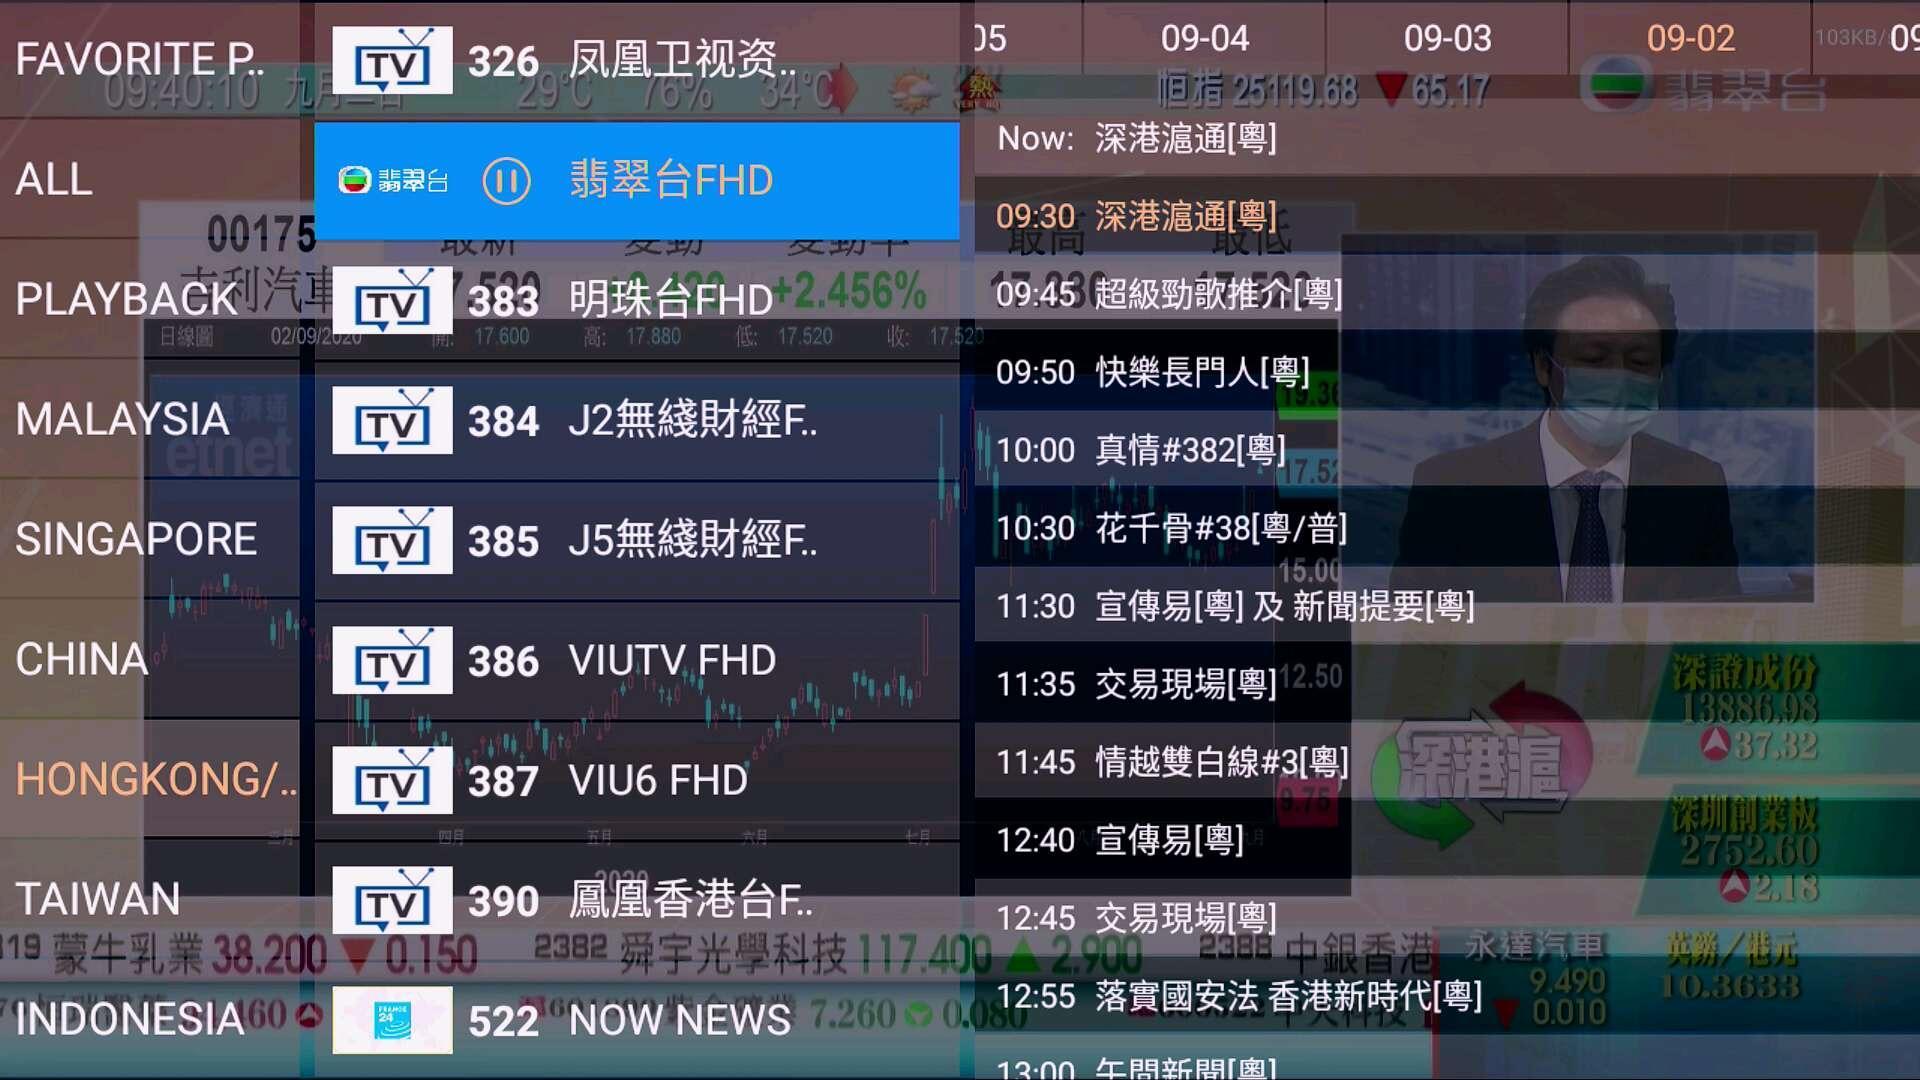 2020 latest Singapore Malaysia tv box iFibre Cloud all Starhub tv channels astro 13